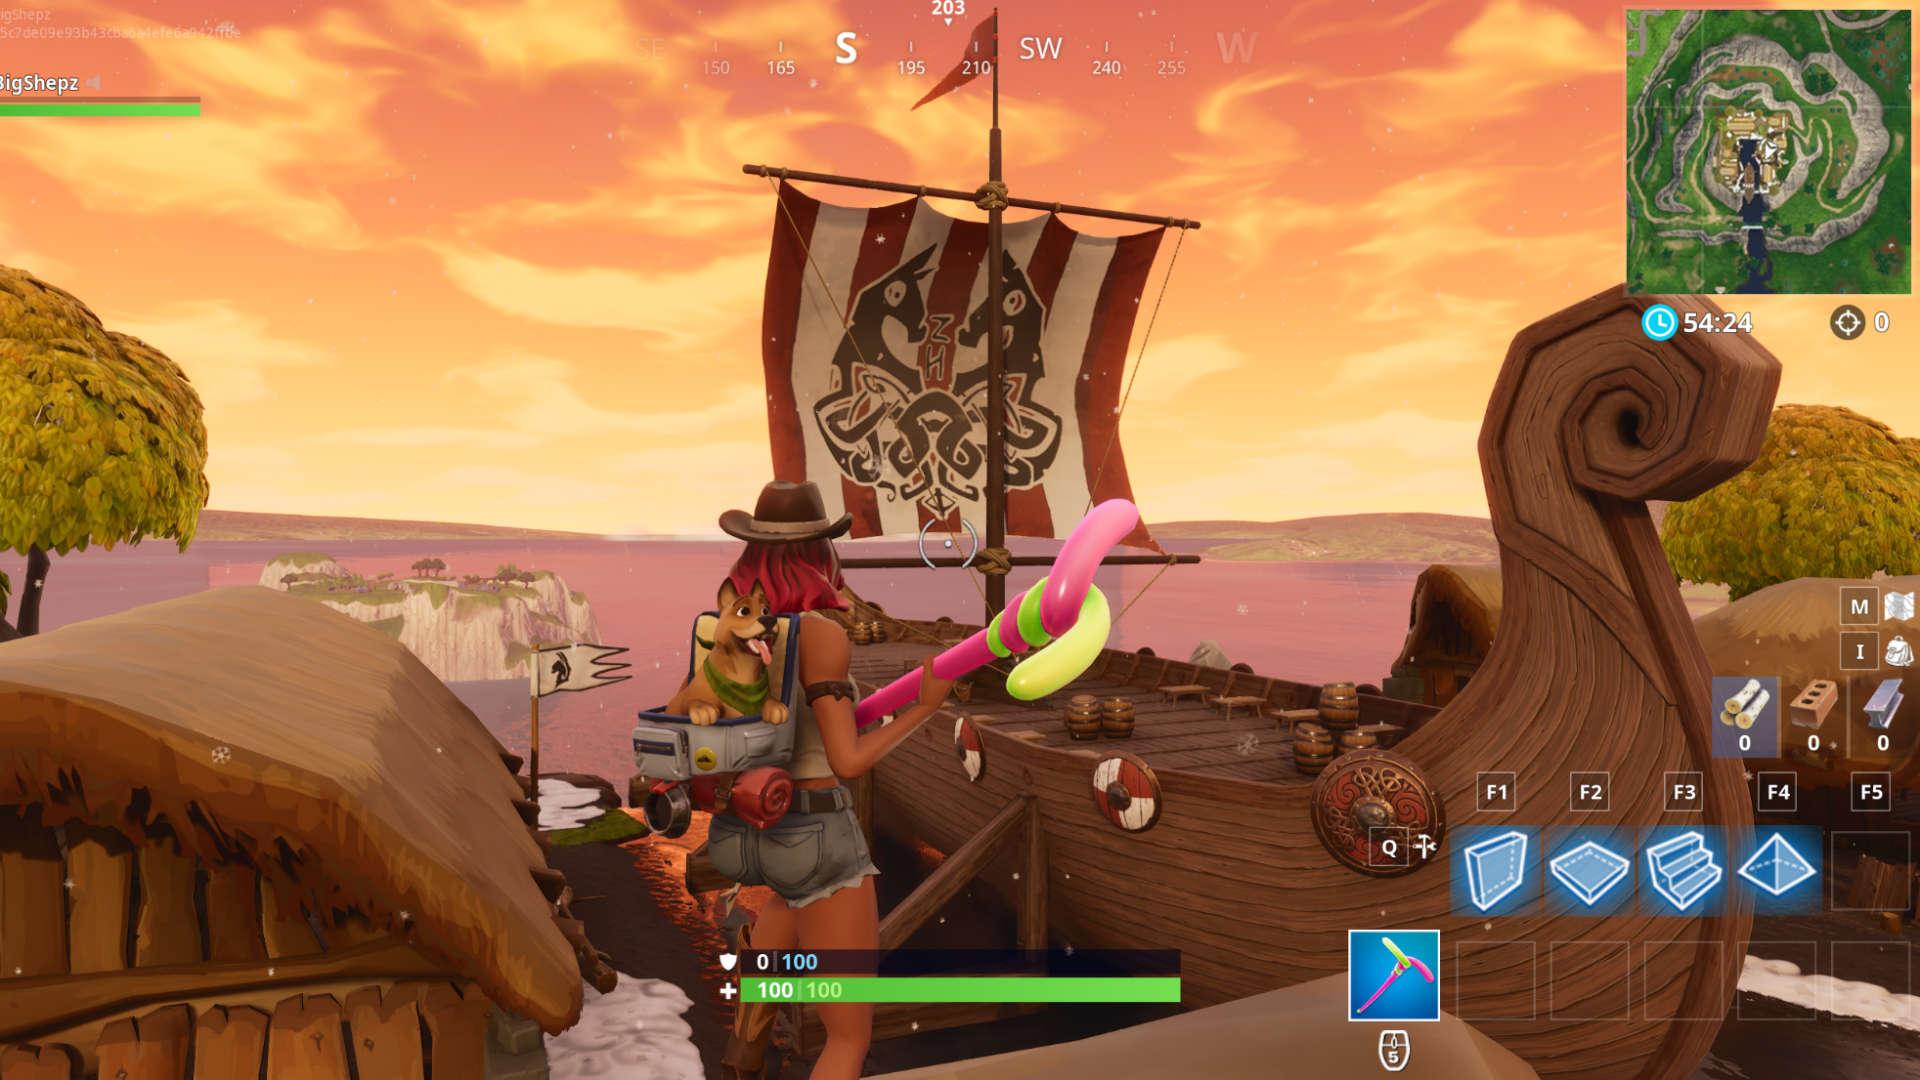 Fortnite Visit A Viking Ship A Camel And A Crashed Battle Bus